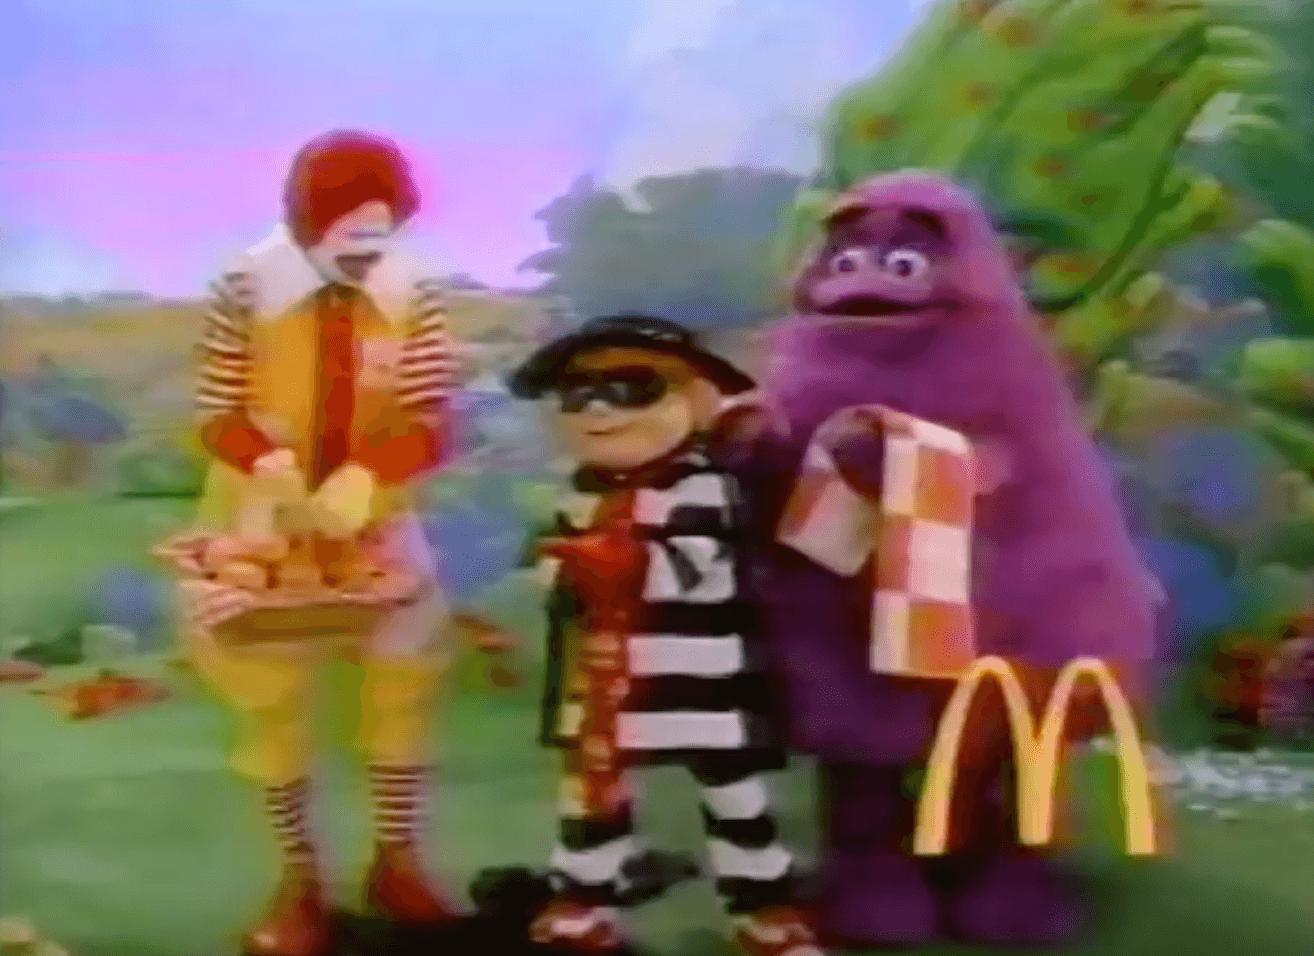 Ronald Mcdonald and friends